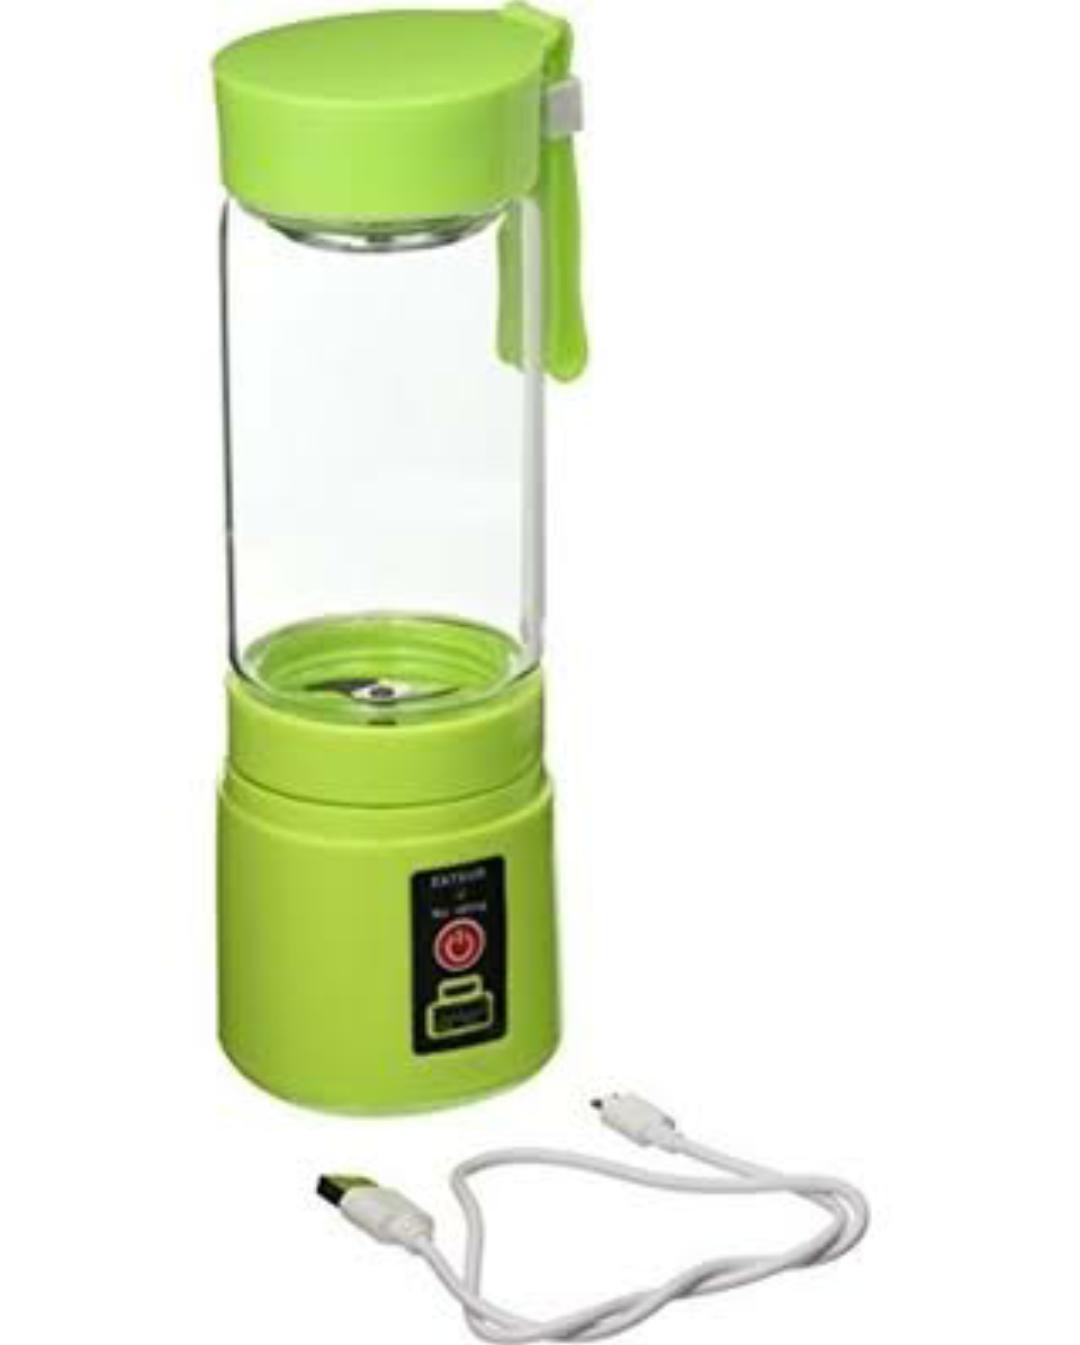 USB Blender / blender mini rechargeable / blender mini portable / shake and take blender - random colour-terbaru